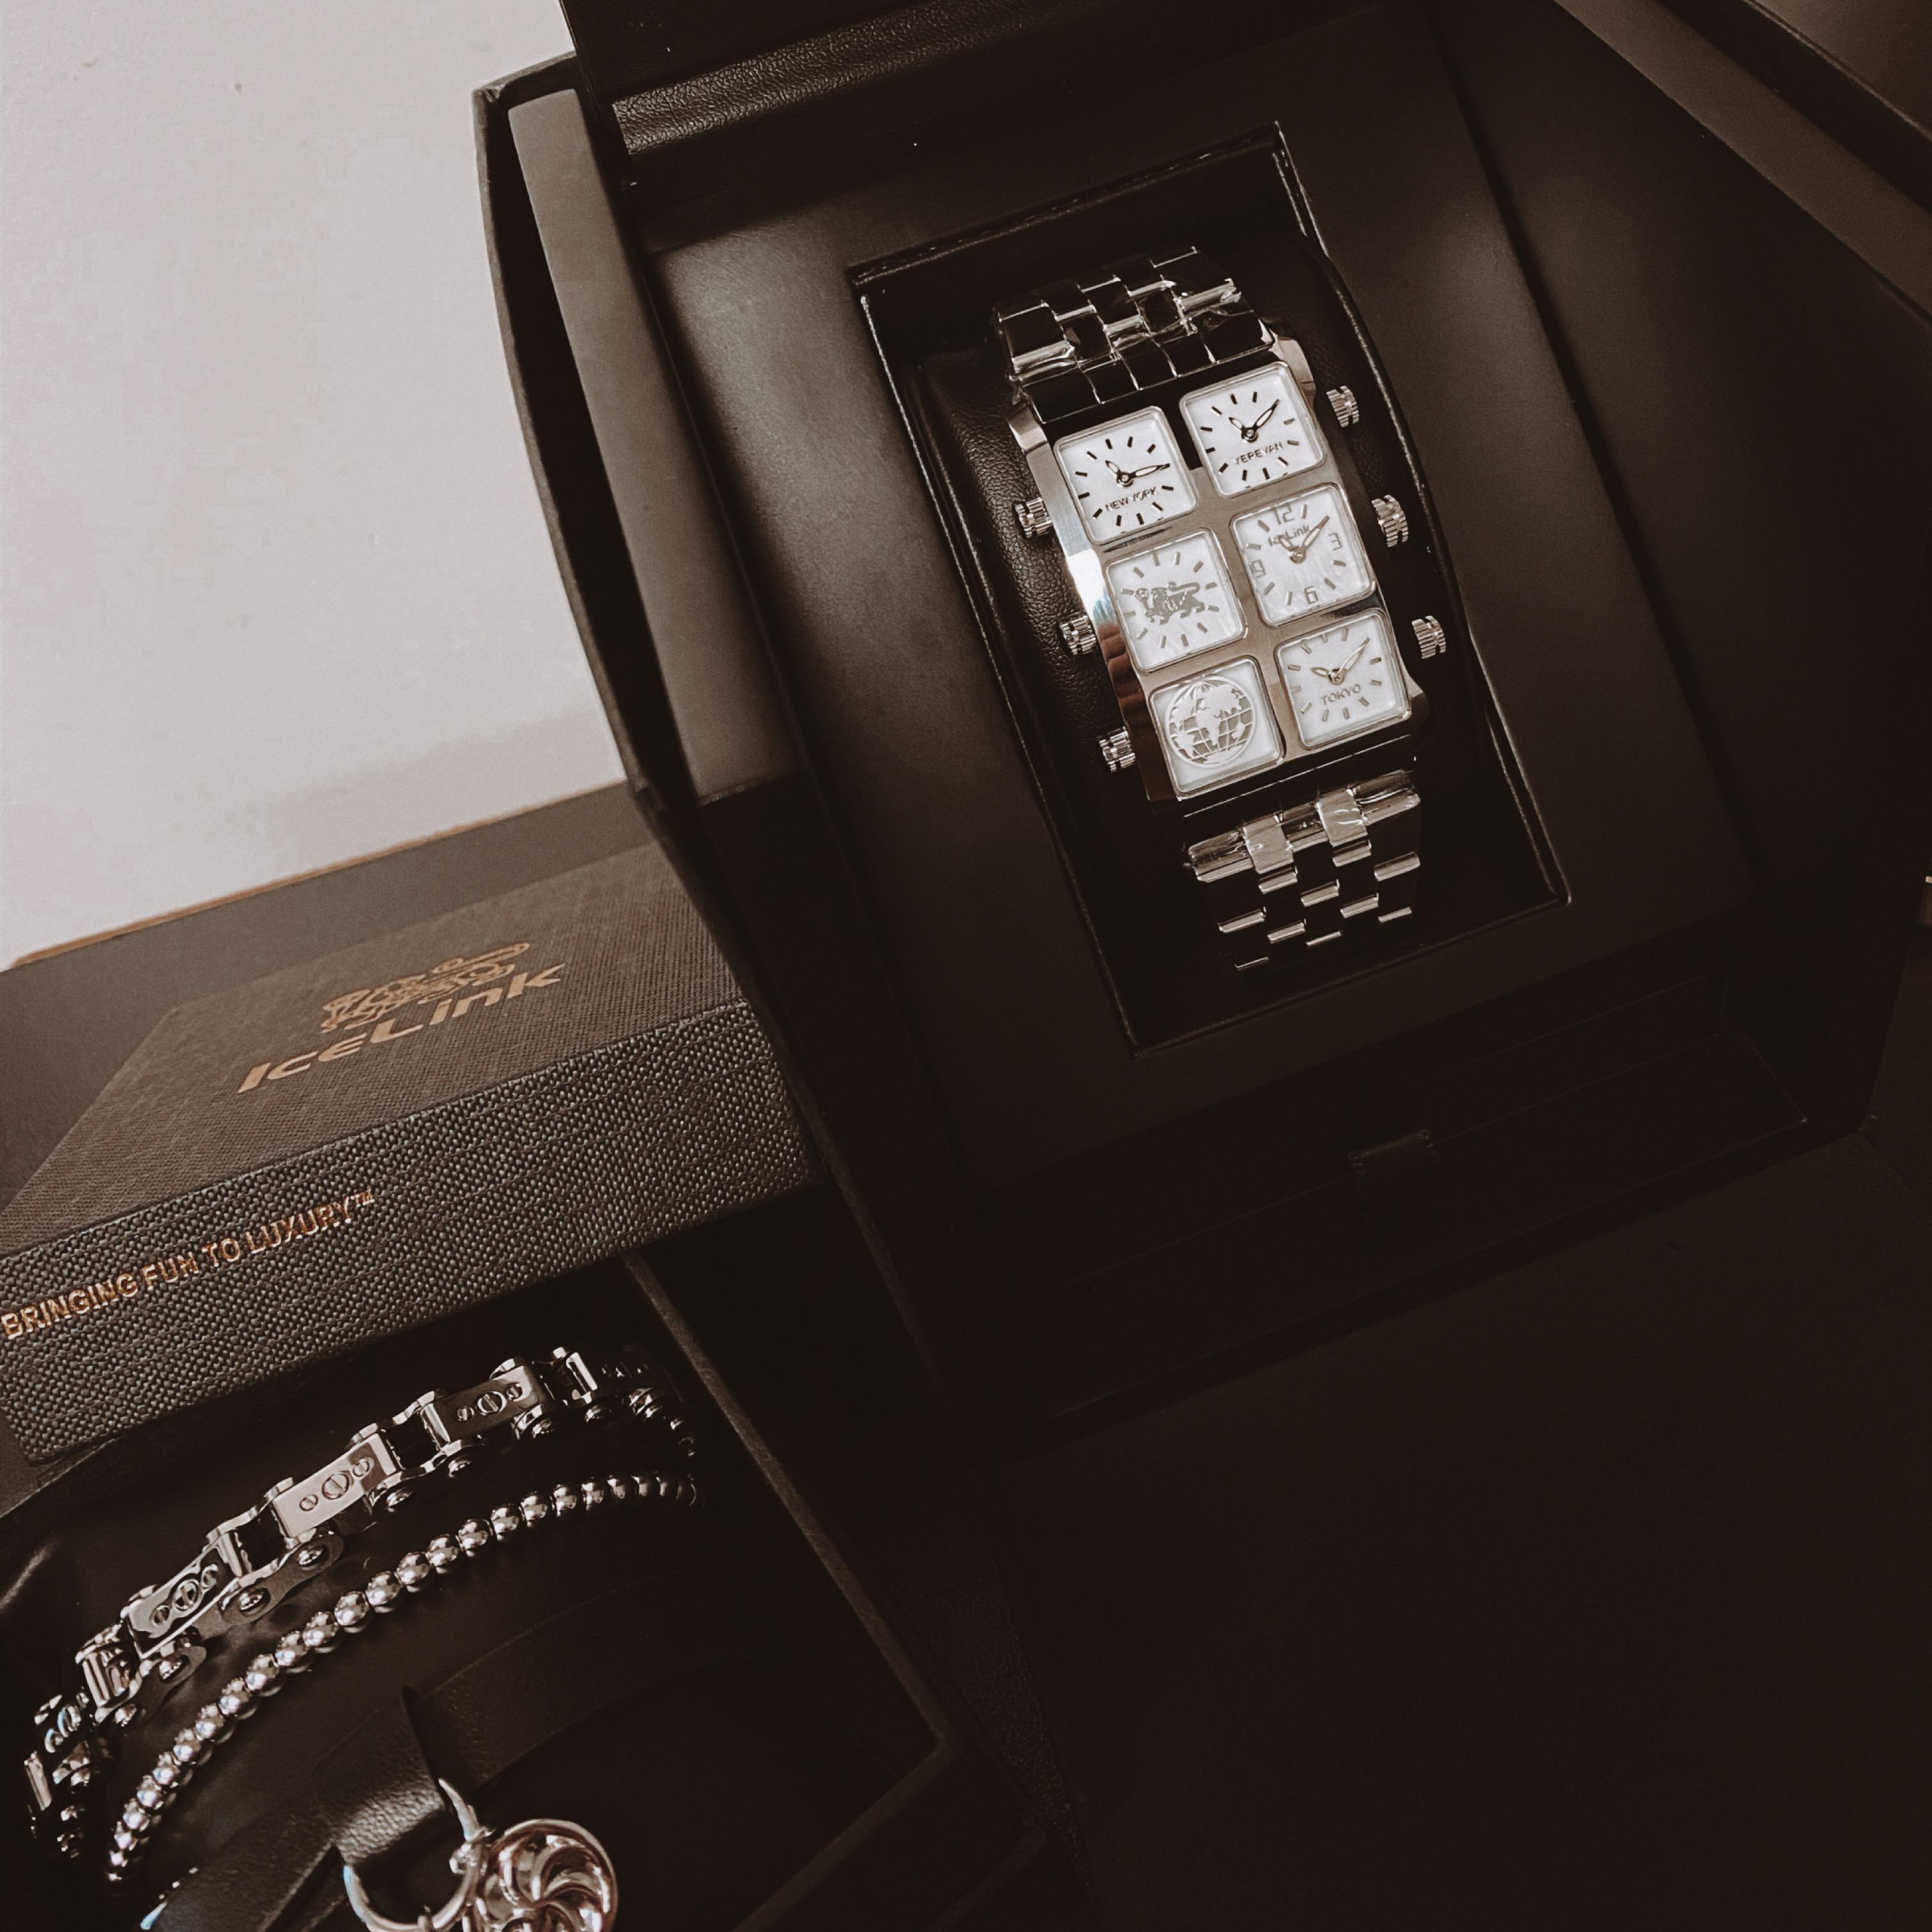 Zuri Metal 40mm Multi-Time Zone Watch in gift box